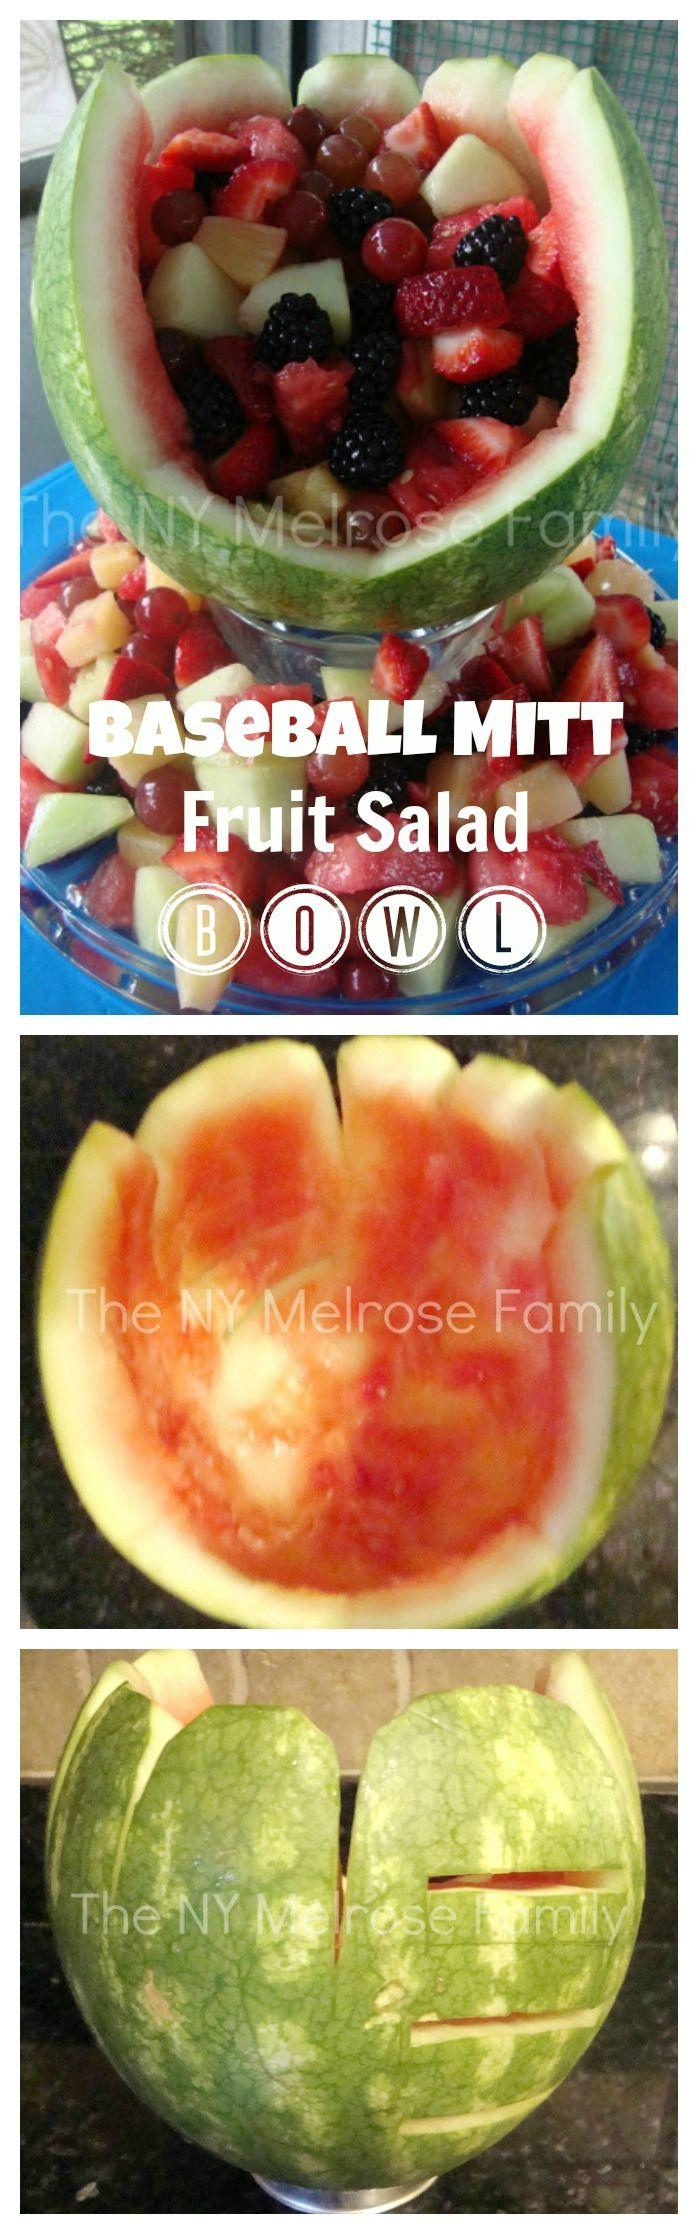 Baseball Mitt Fruit Salad Bowl #fruitsalad